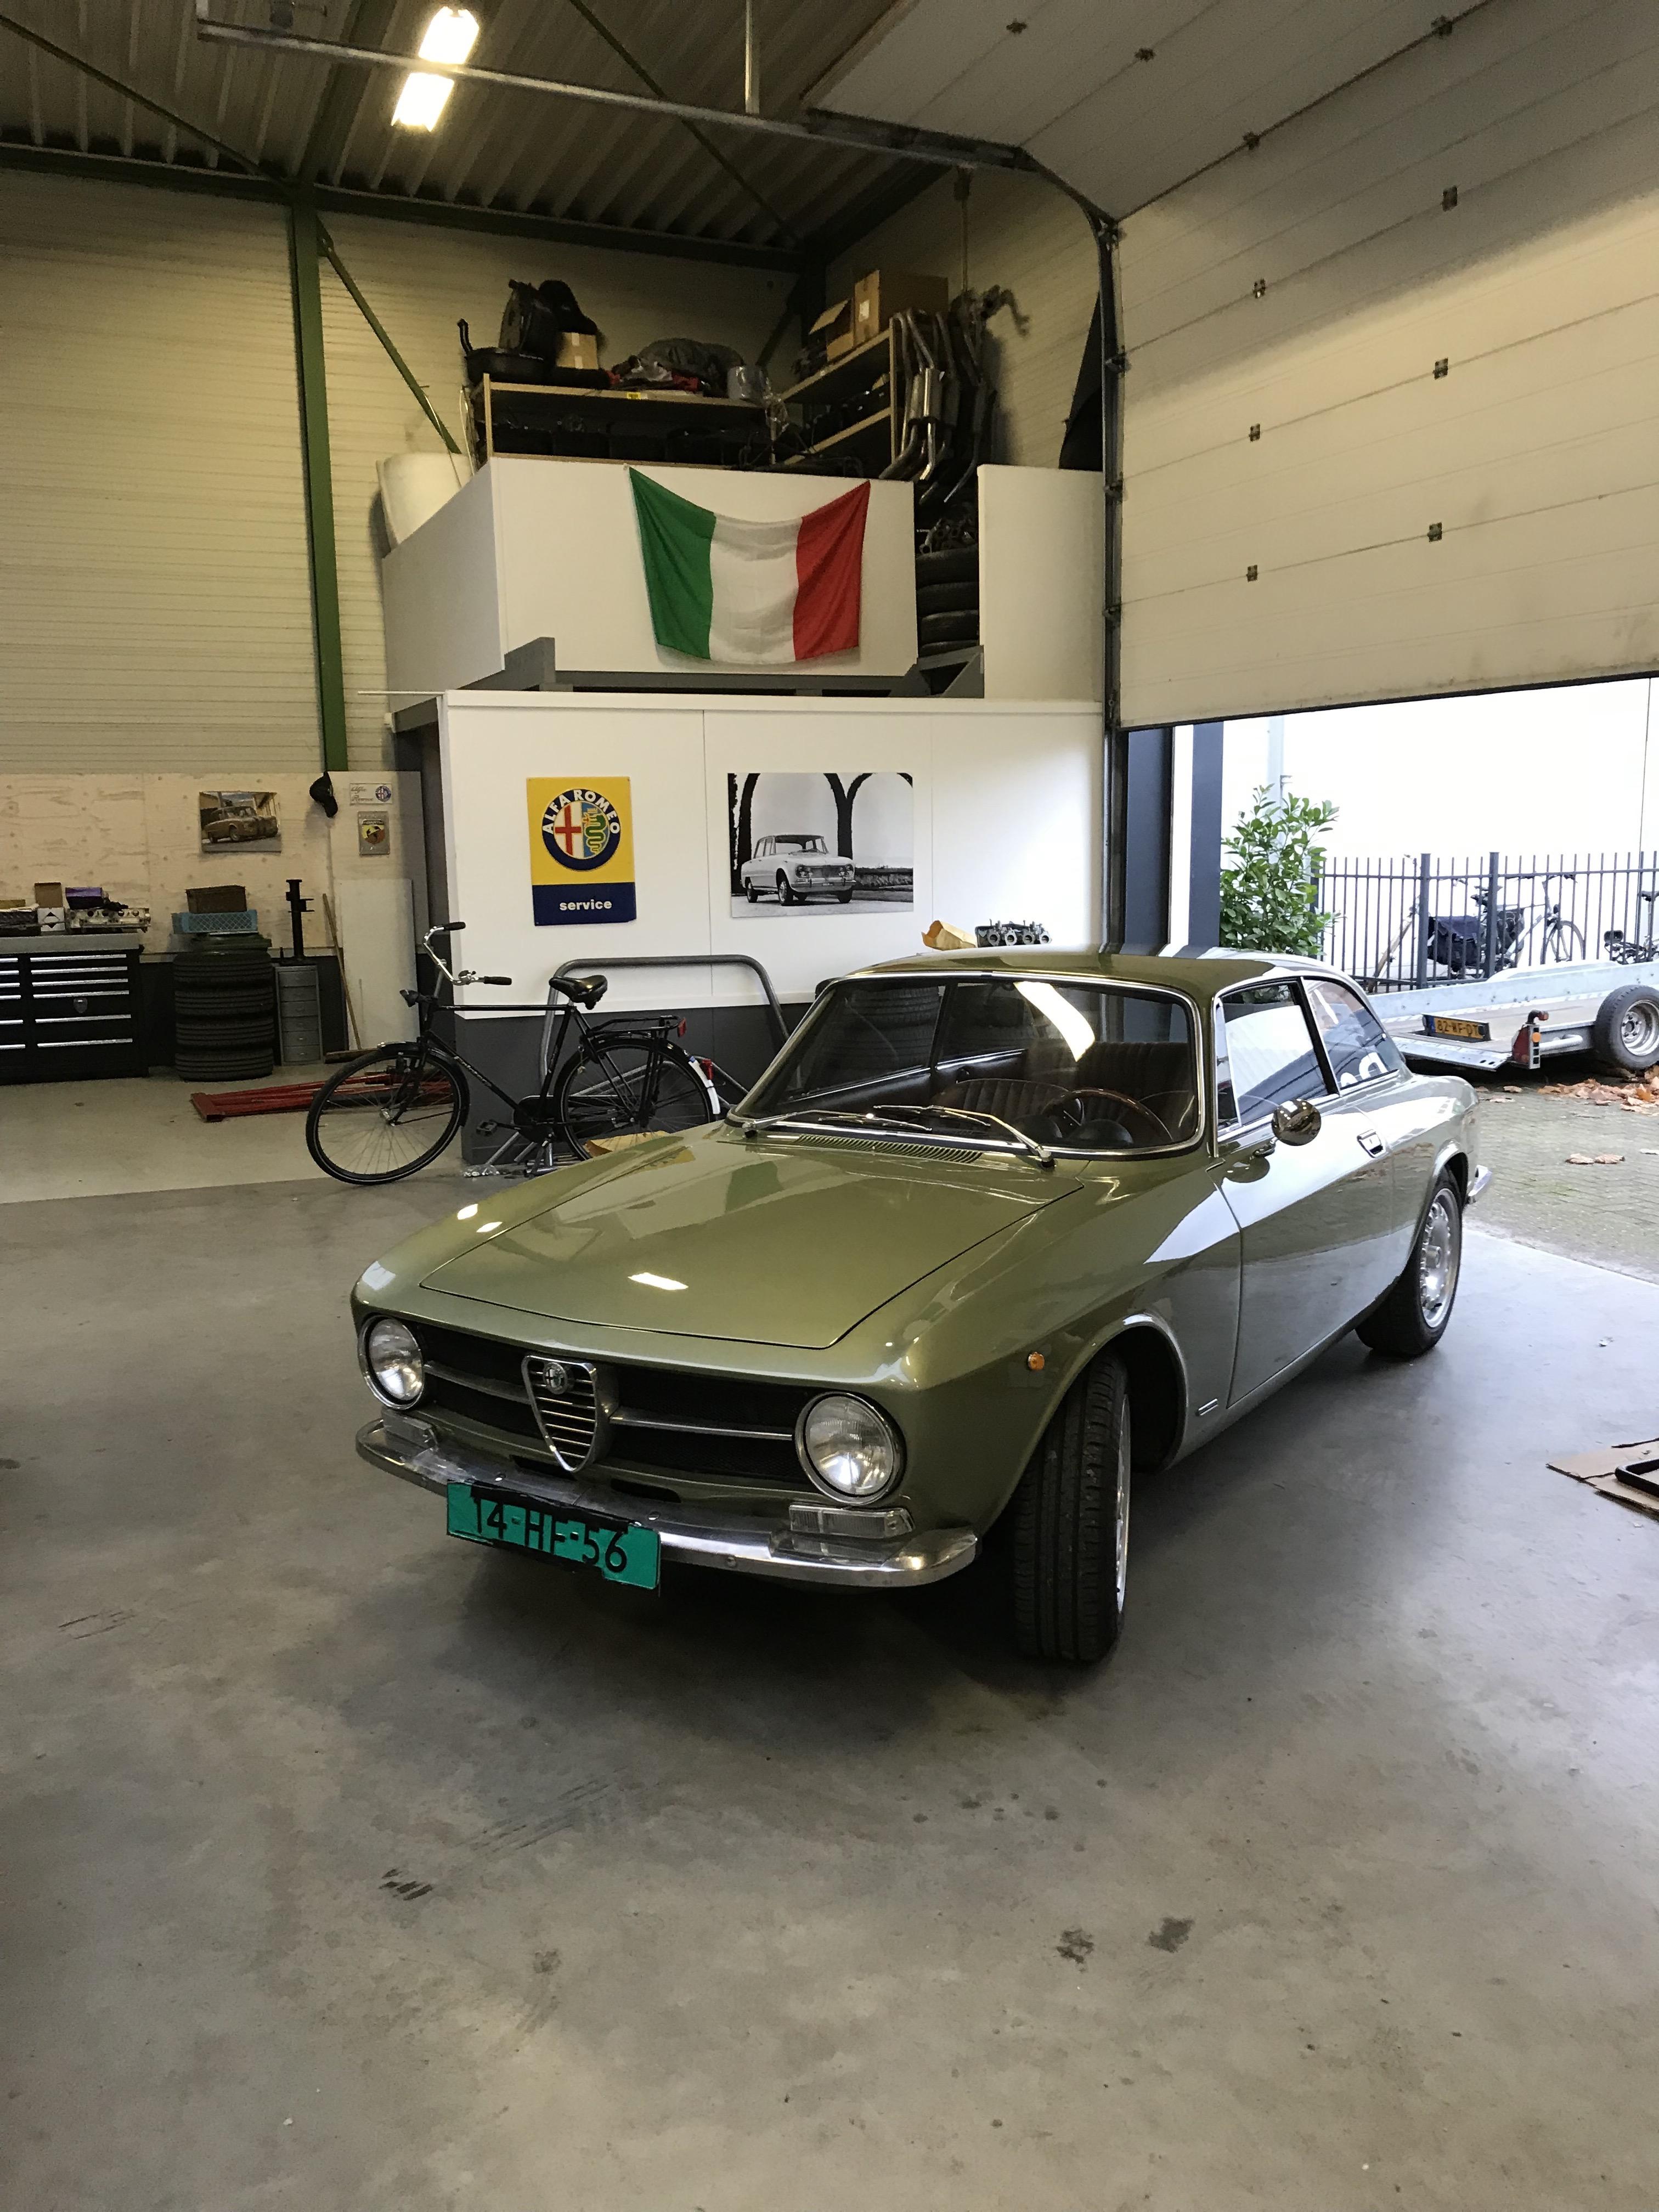 bertone GT 1300 Junior - 1973 - Vert Olive FHgWwX